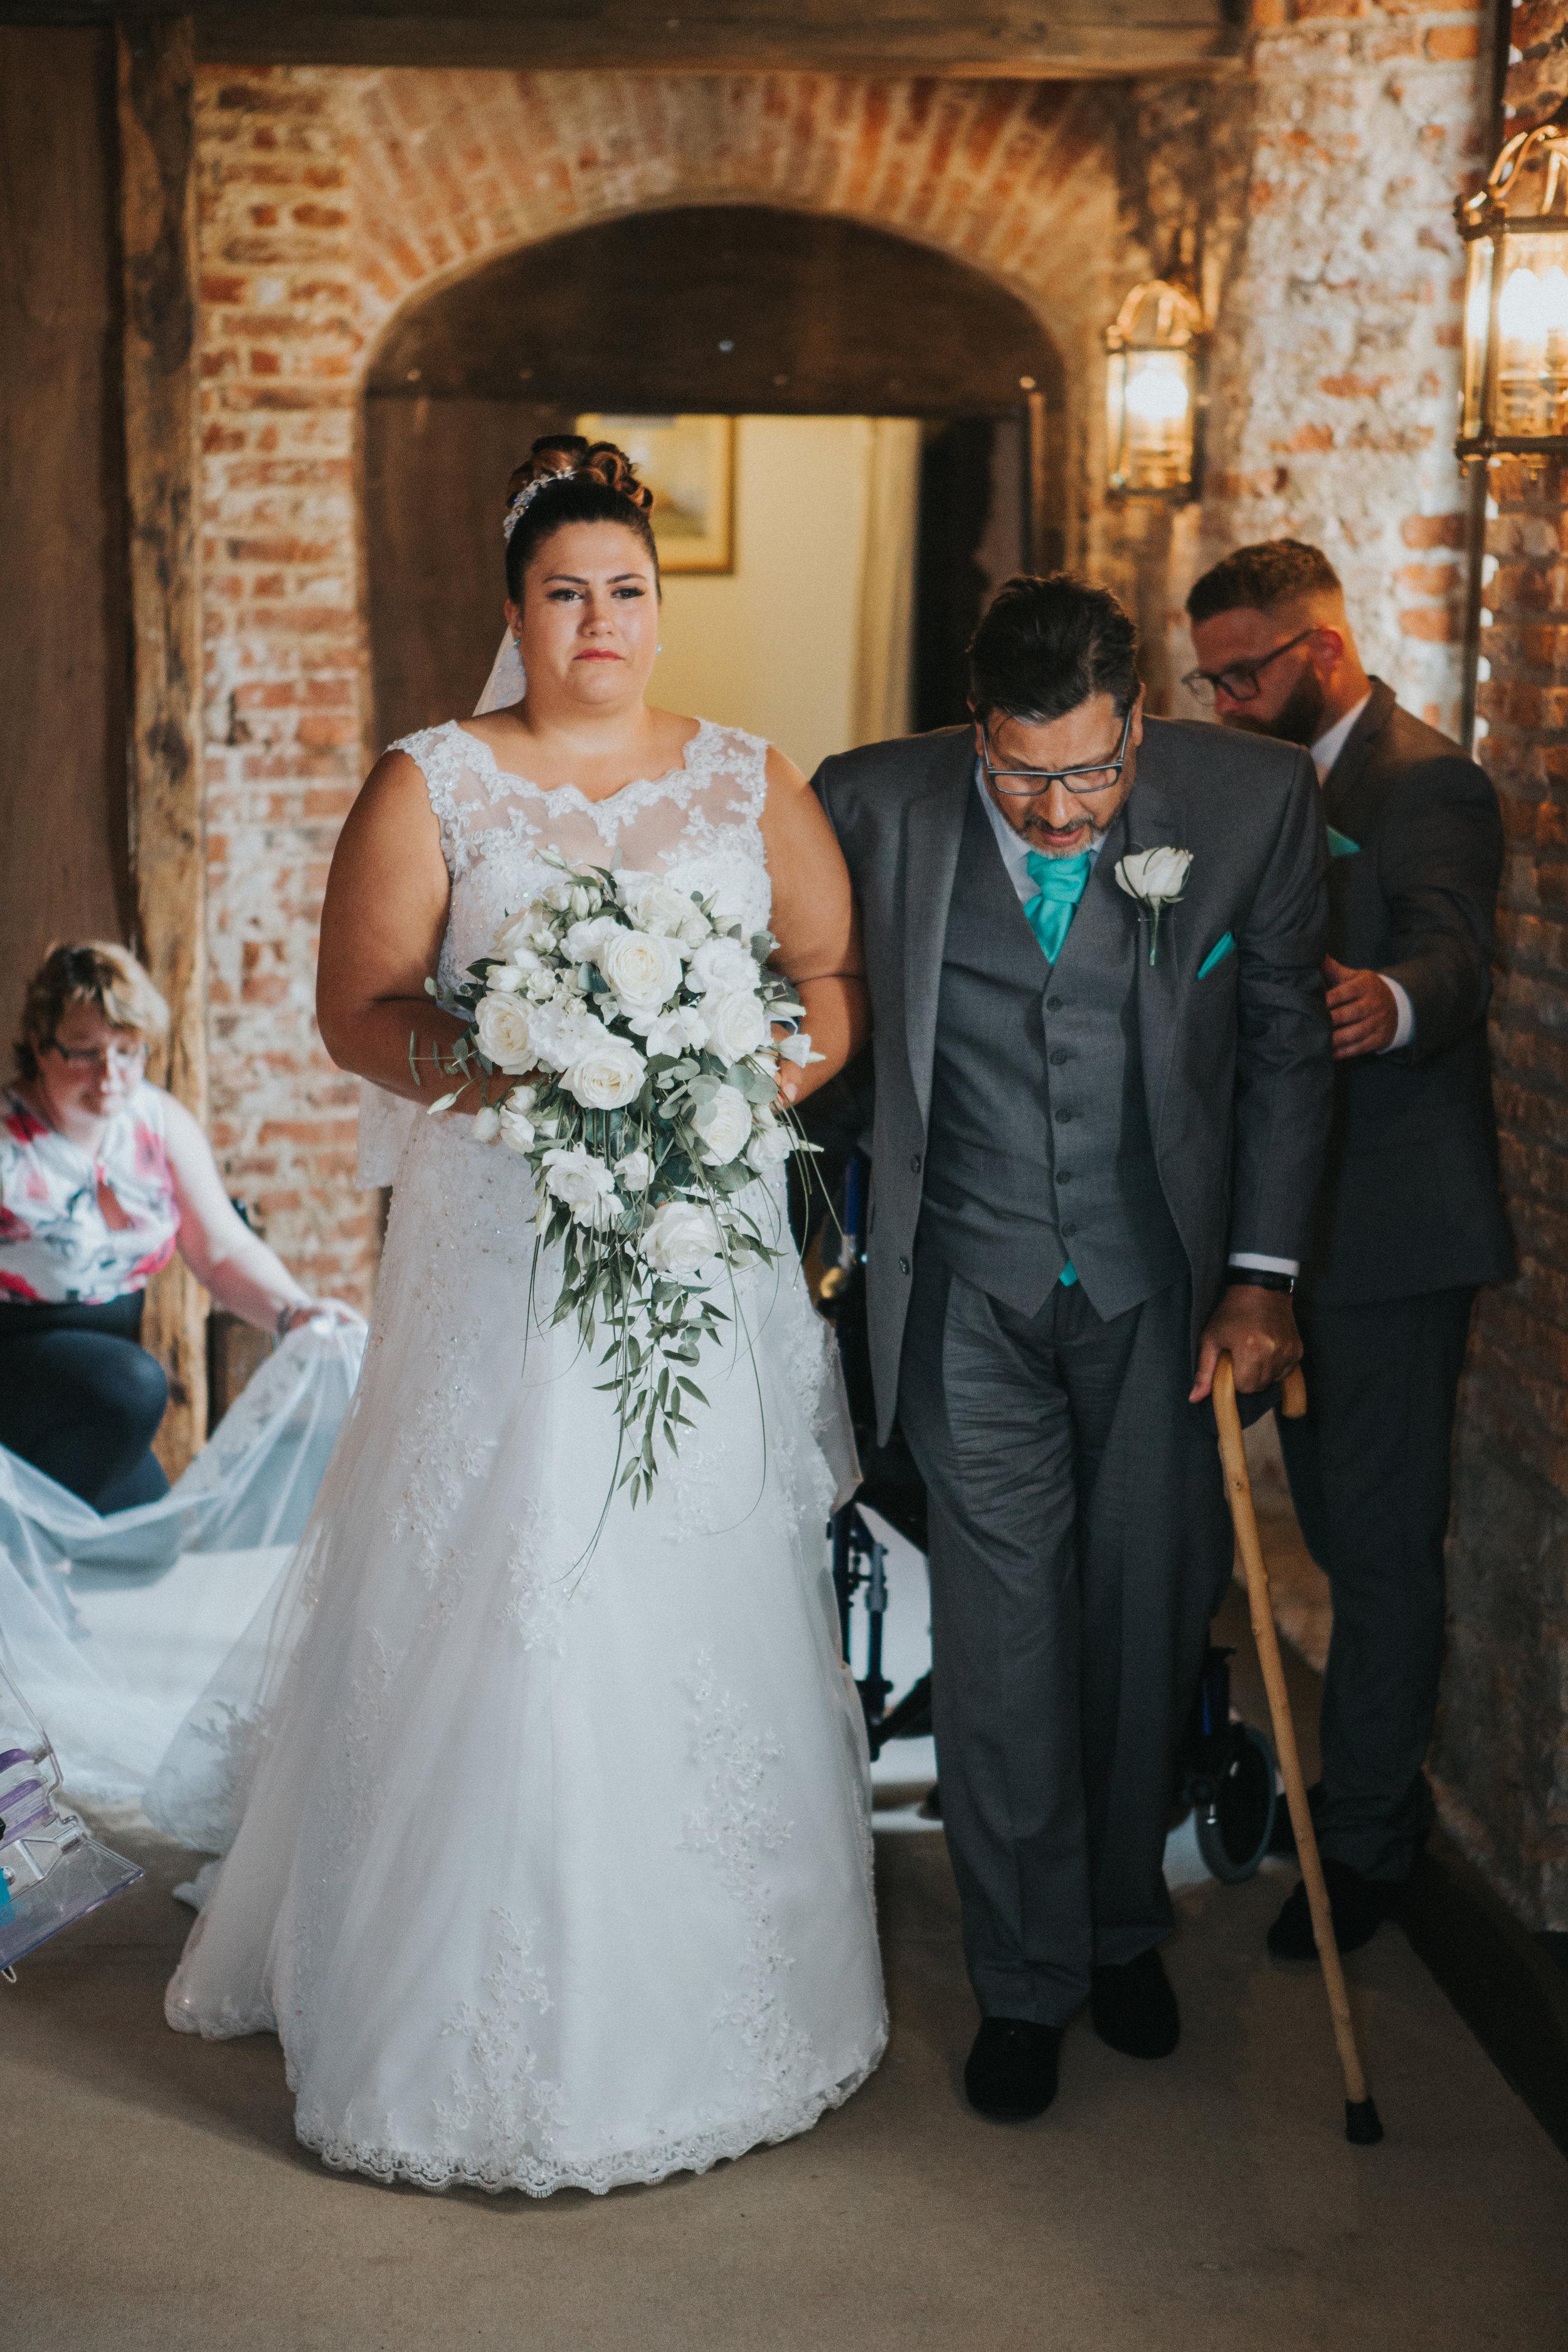 westenhangar-castle-kent-london-wedding-photography-bride-aisle-35